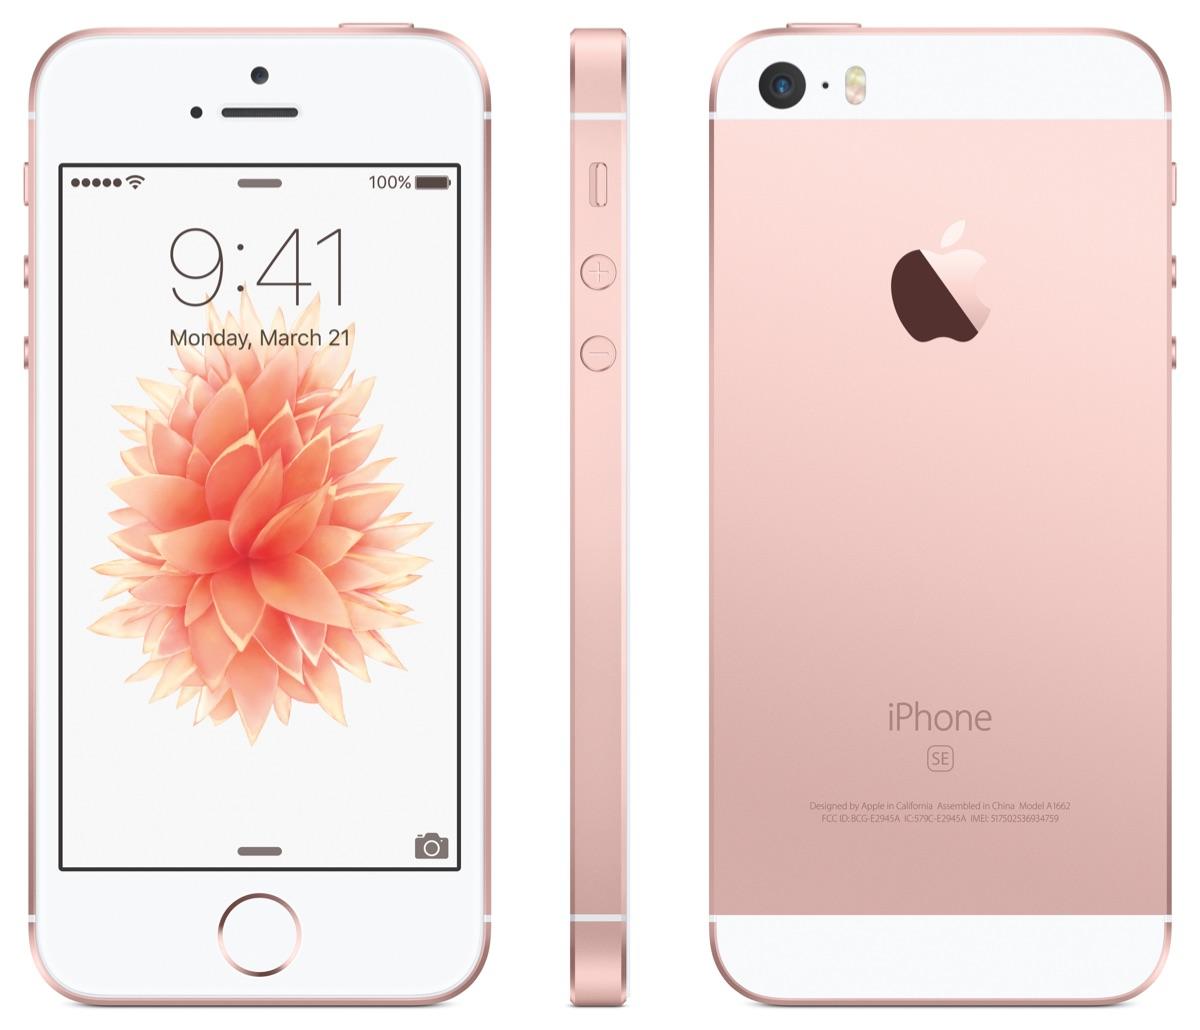 au,ドコモ,ソフトバンクが「iPhone SE」予約受付発表!24日16時1分から順次開始!